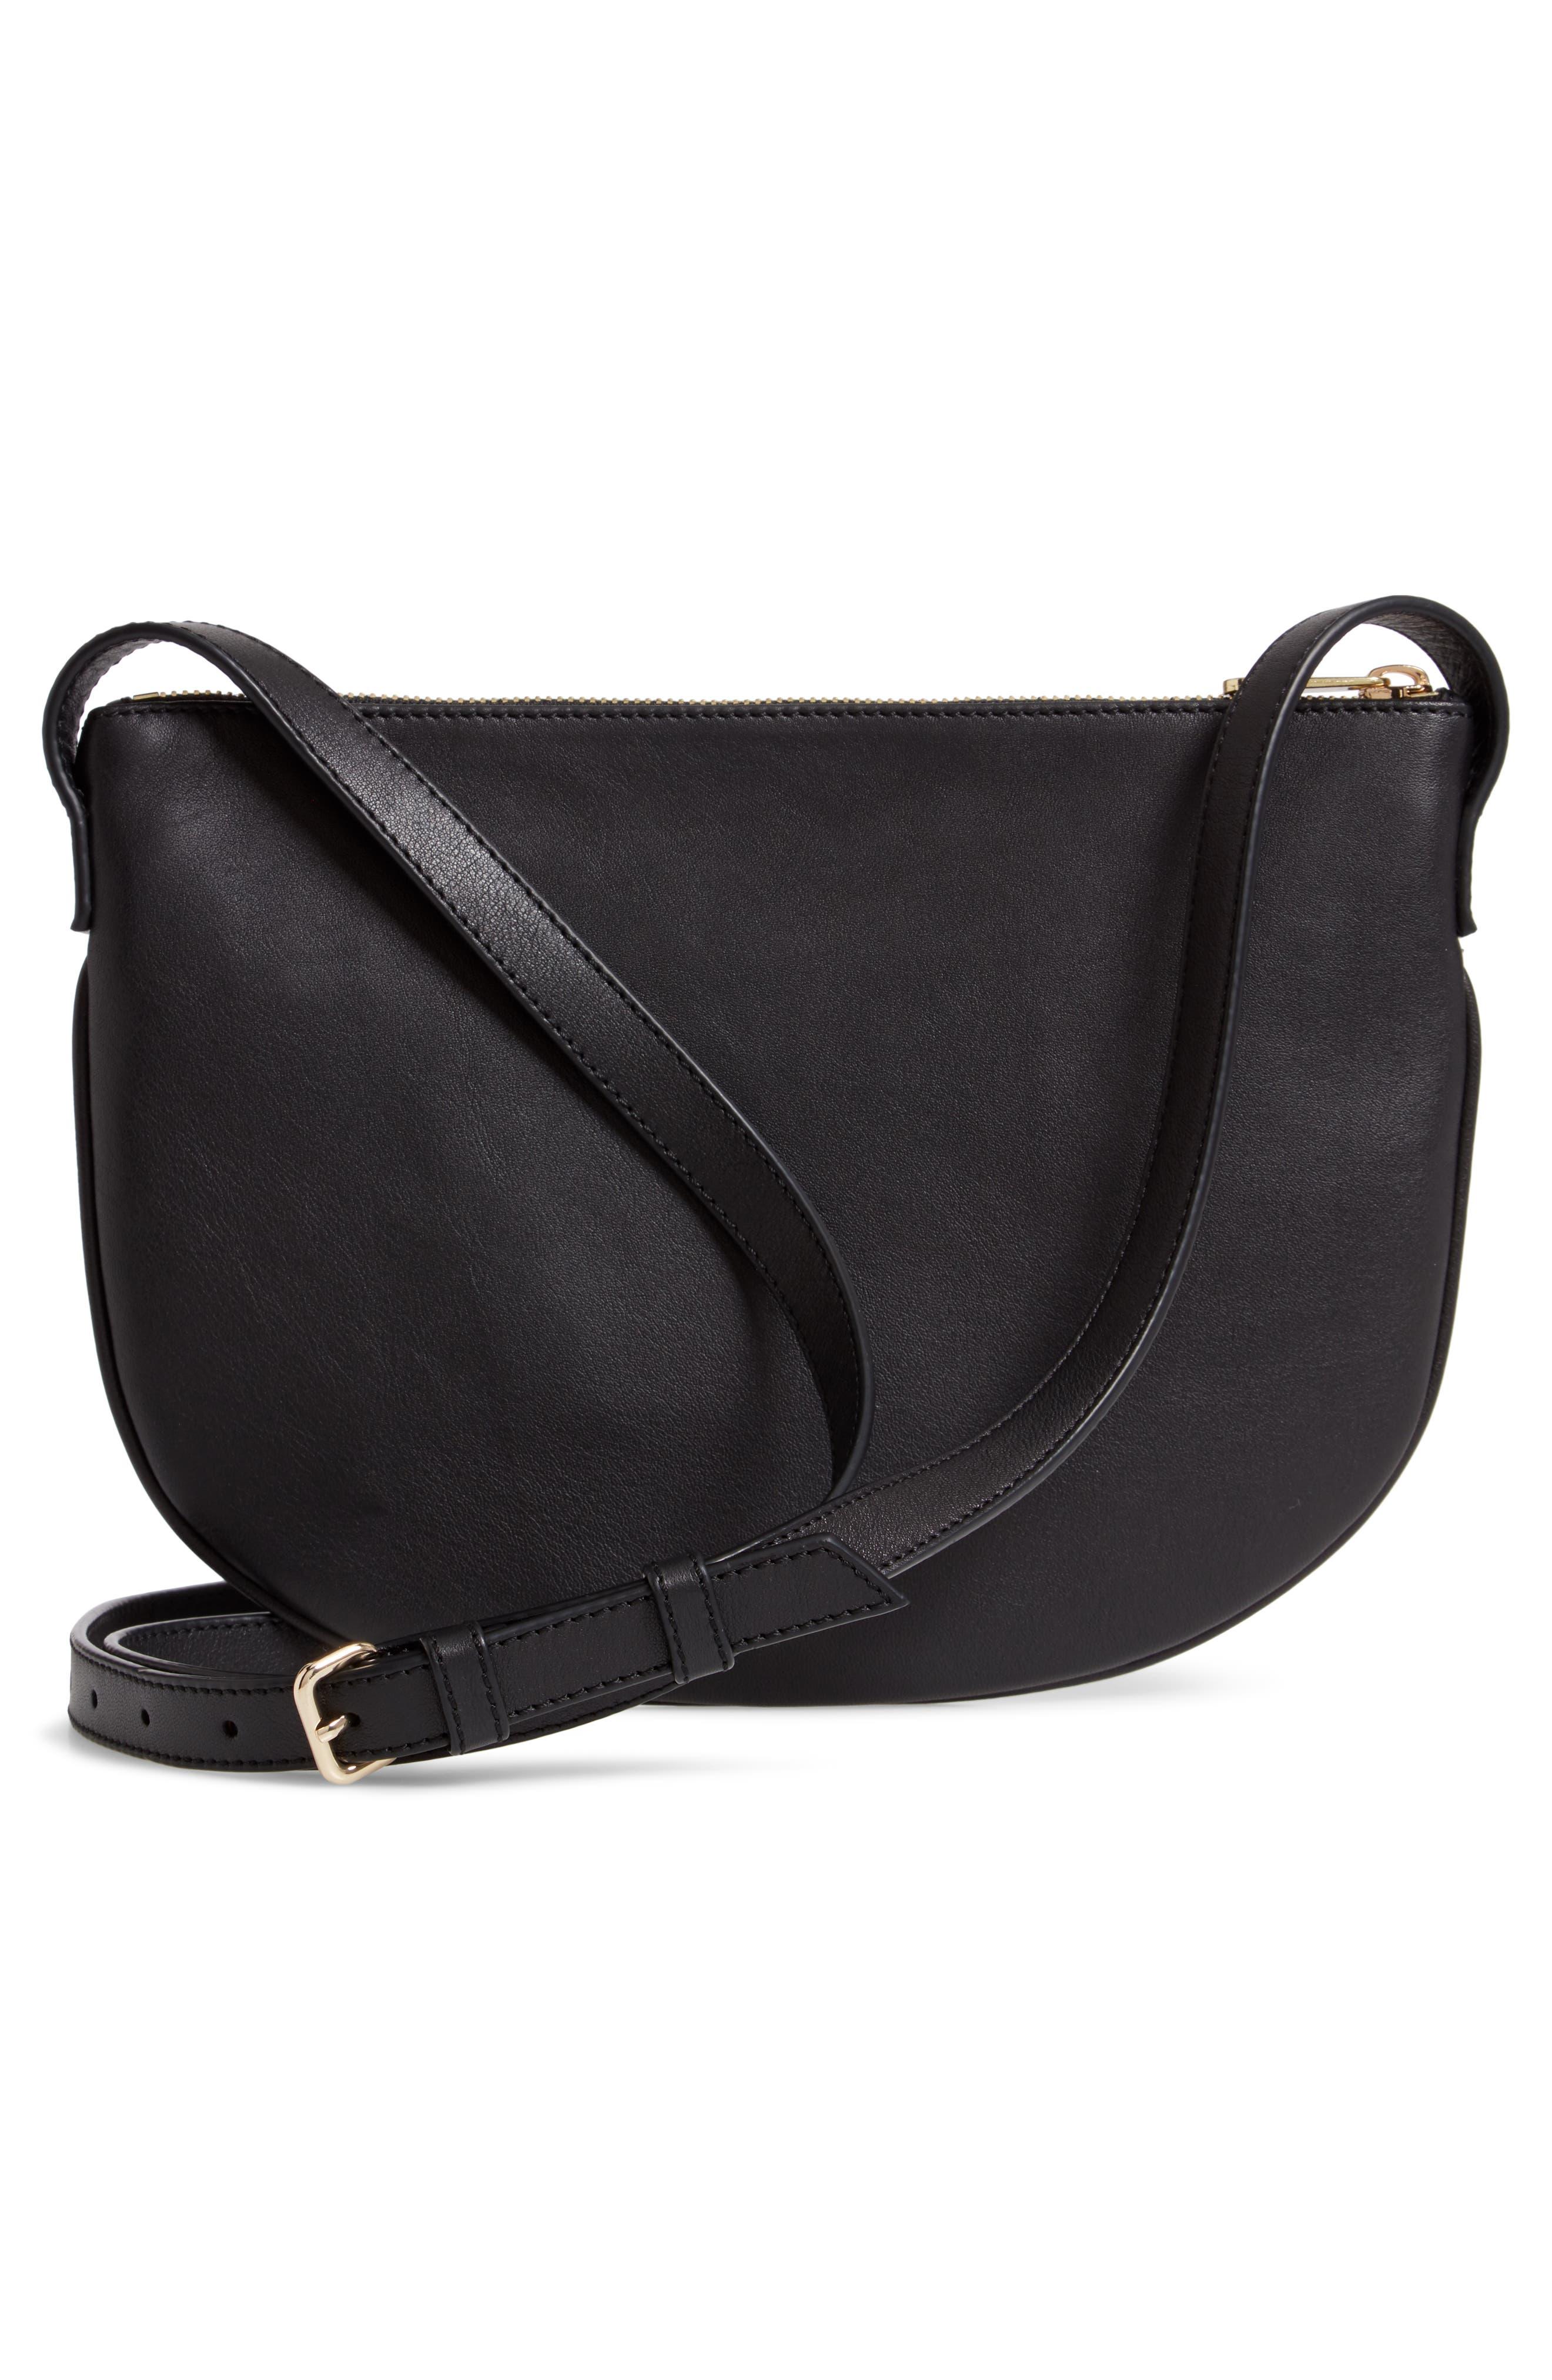 A.P.C., Sac Maelys Leather Crossbody Bag, Alternate thumbnail 4, color, LZZ NOIR